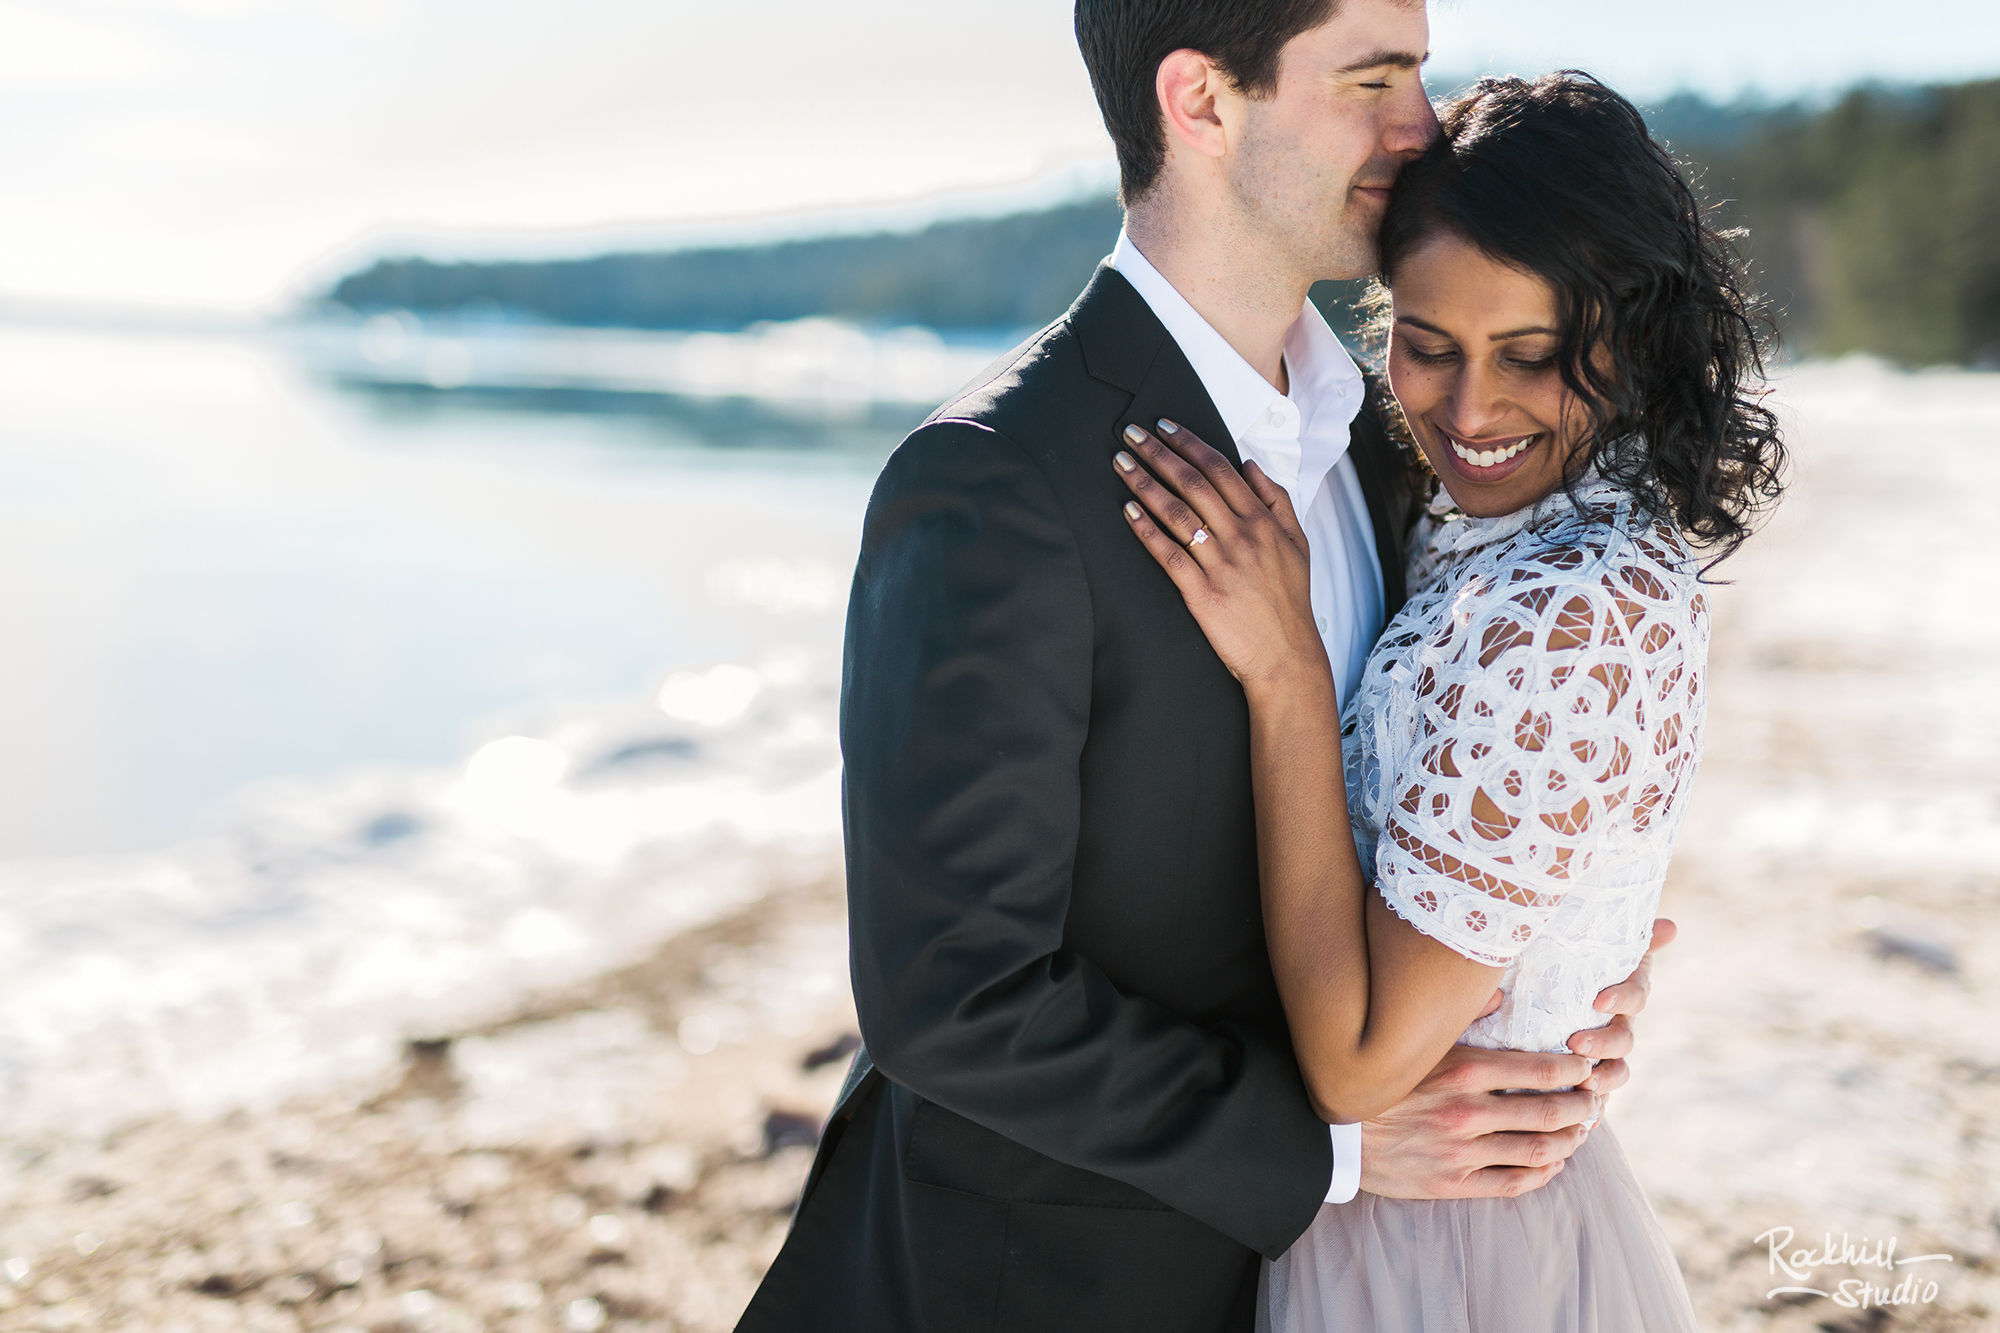 northern-michigan-wedding-marquette-engagement-upper-peninsula-michigan-rockhill-winter-21.jpg